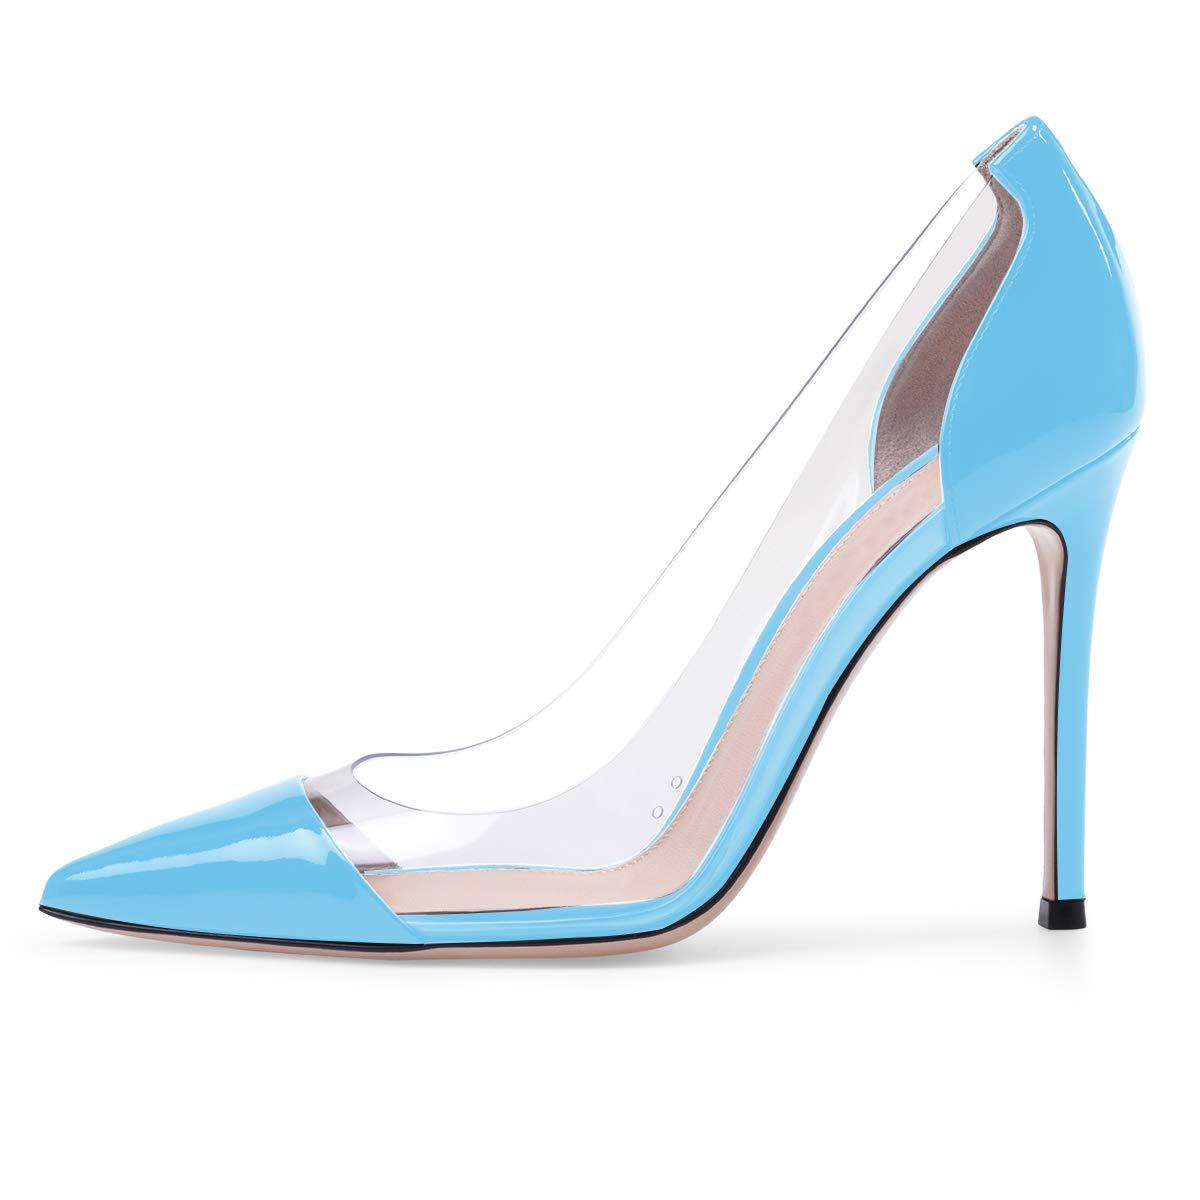 Eldof Women's 100mm Pointed Toe Transparent High Heels Pumps Party Wedding Dress Shoes Blue US11.5